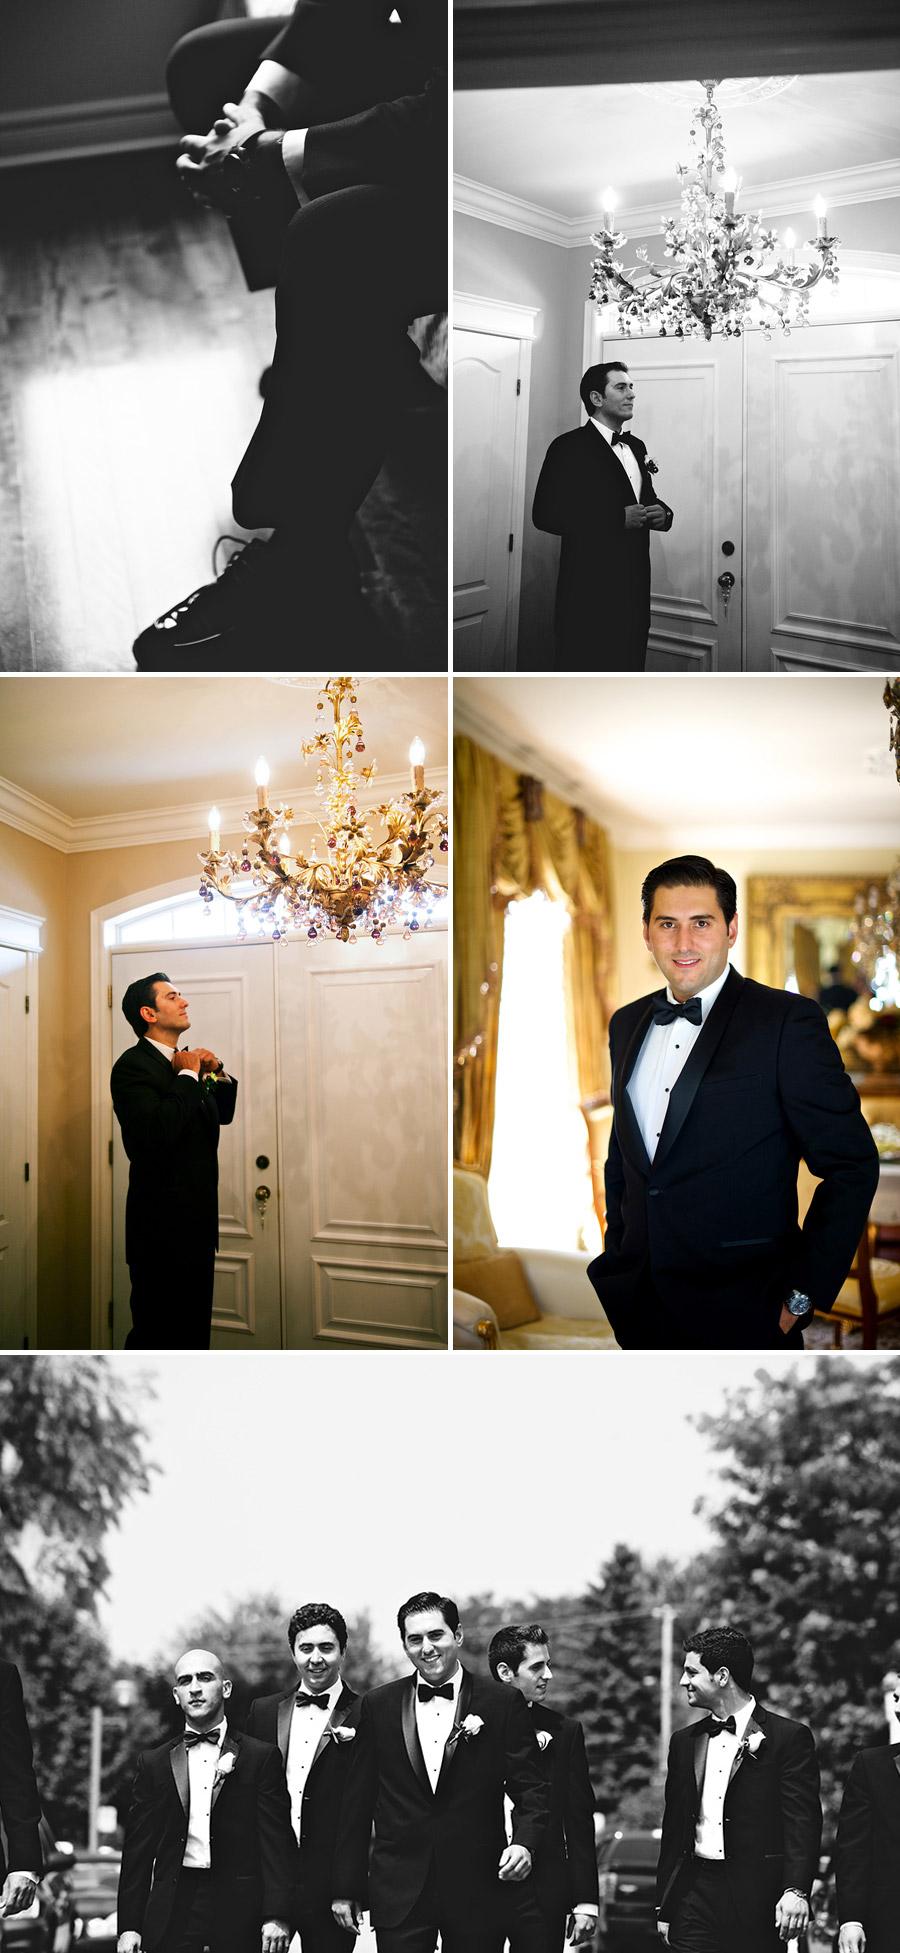 Blog-Collage-1409508103986.jpg